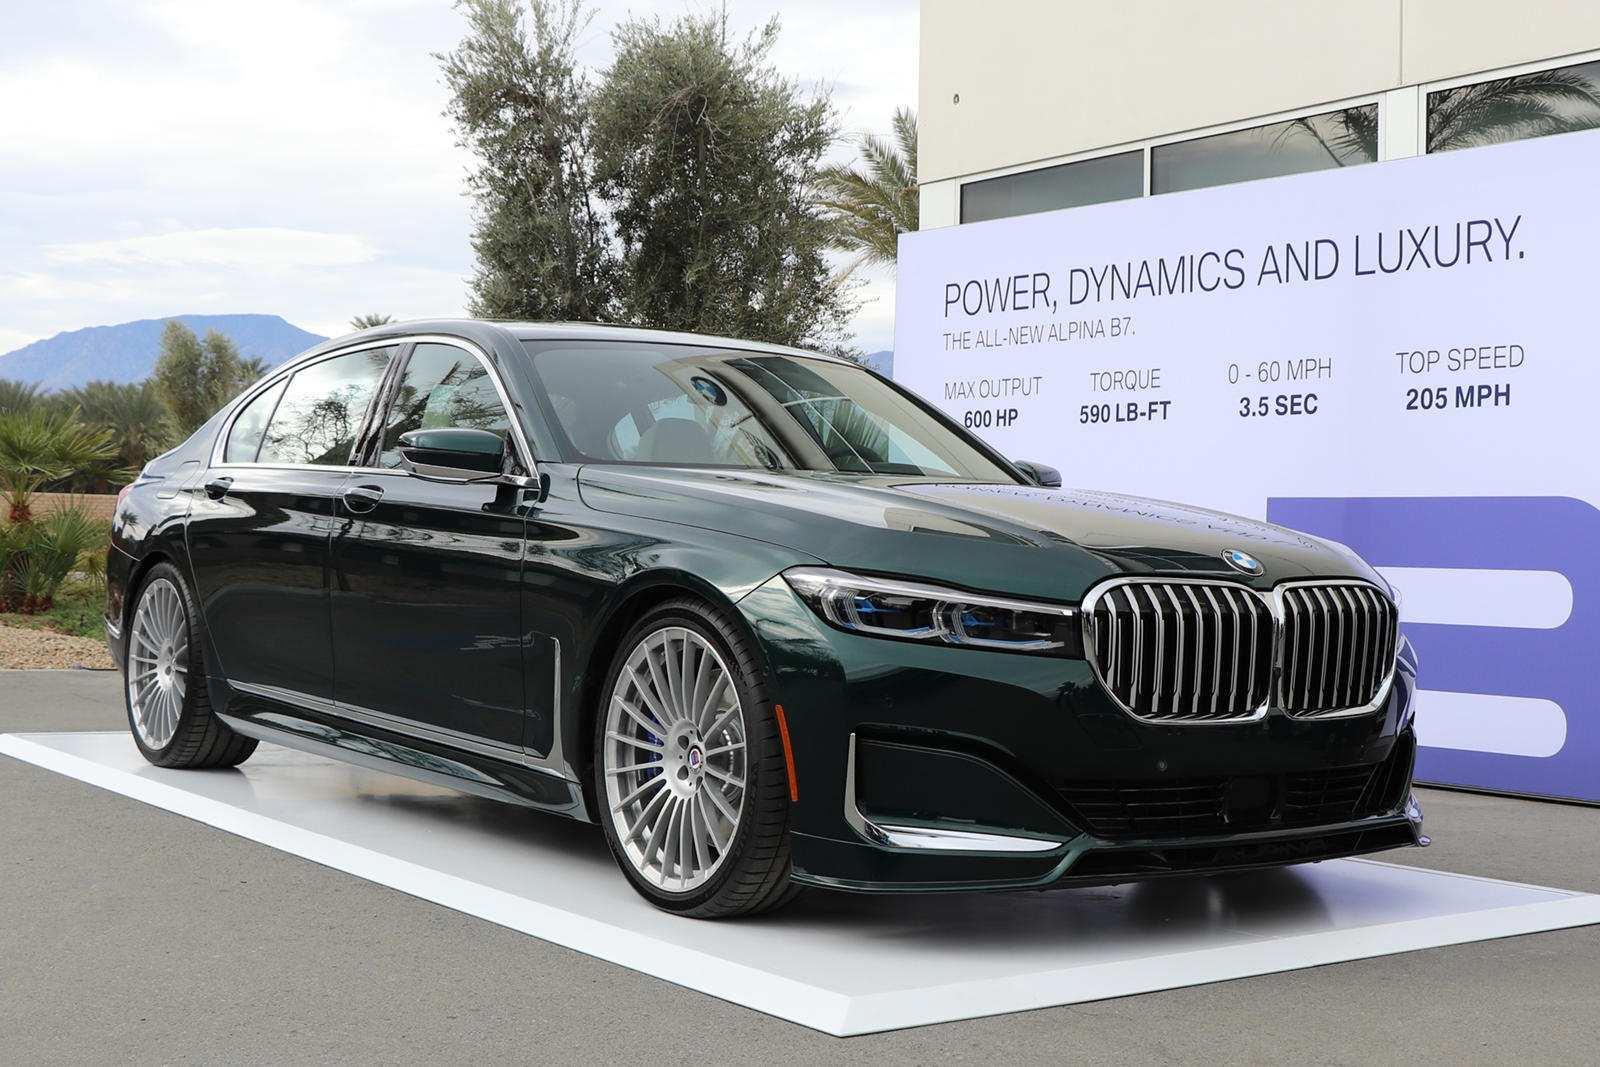 16 New BMW Alpina B8 2020 Interior by BMW Alpina B8 2020